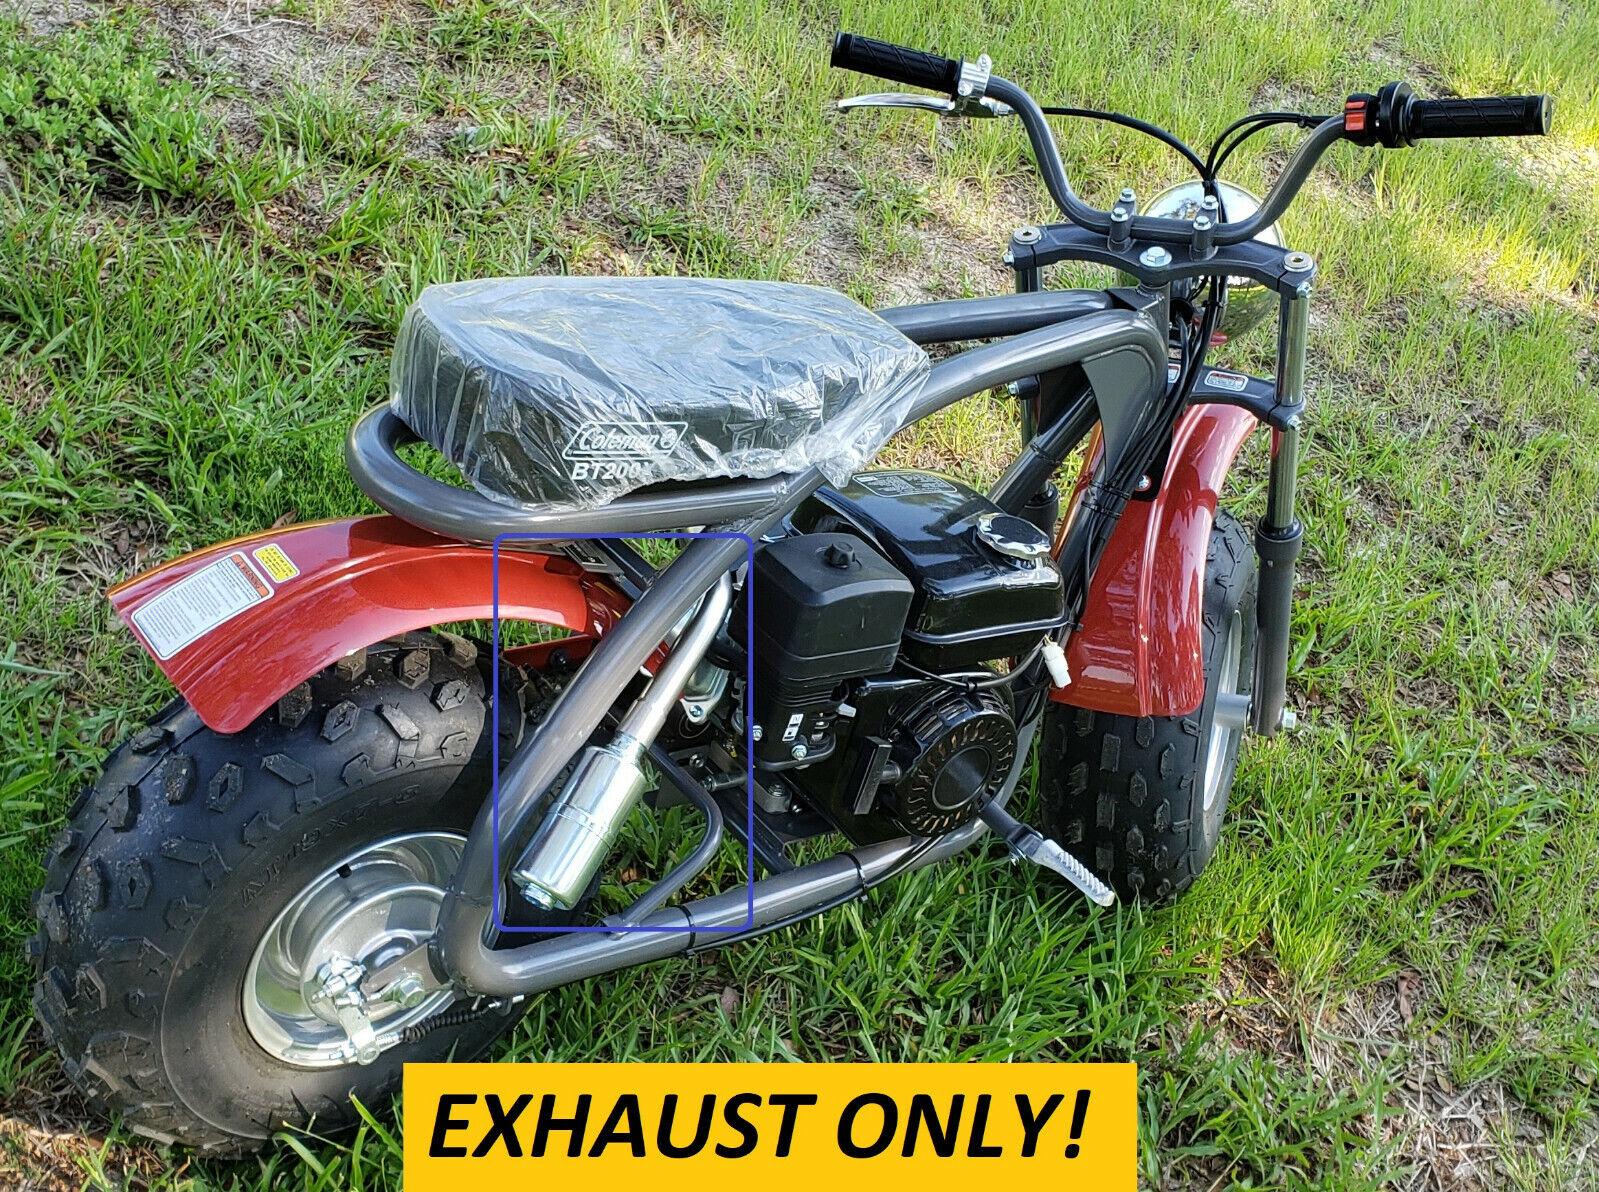 Exhaust With Muffler for: Coleman BT200X 196cc/6.5HP Gas min